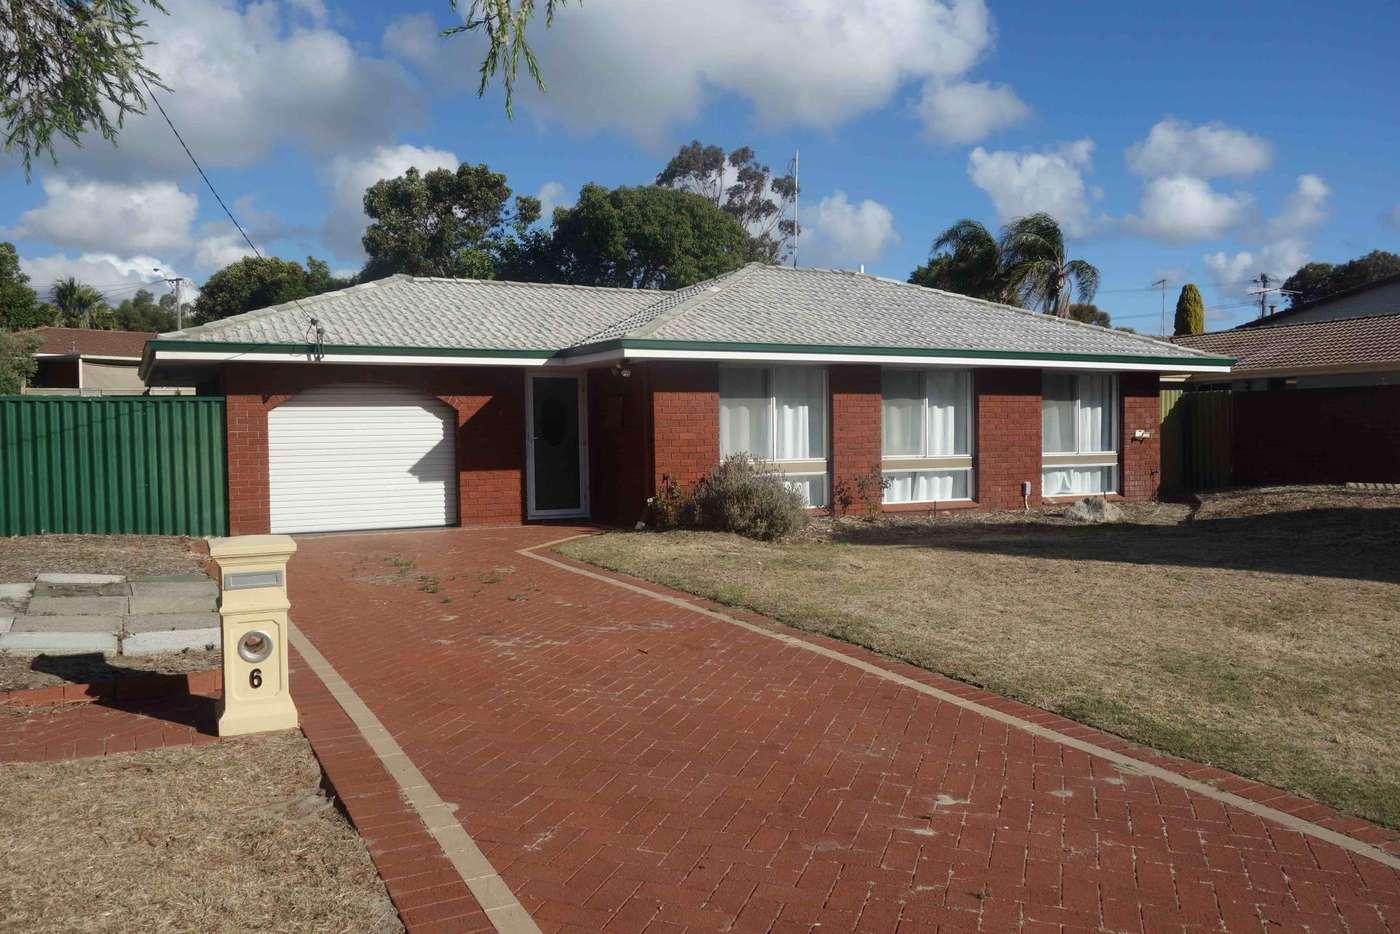 Main view of Homely house listing, 6 Bredhurst Road, Marangaroo WA 6064